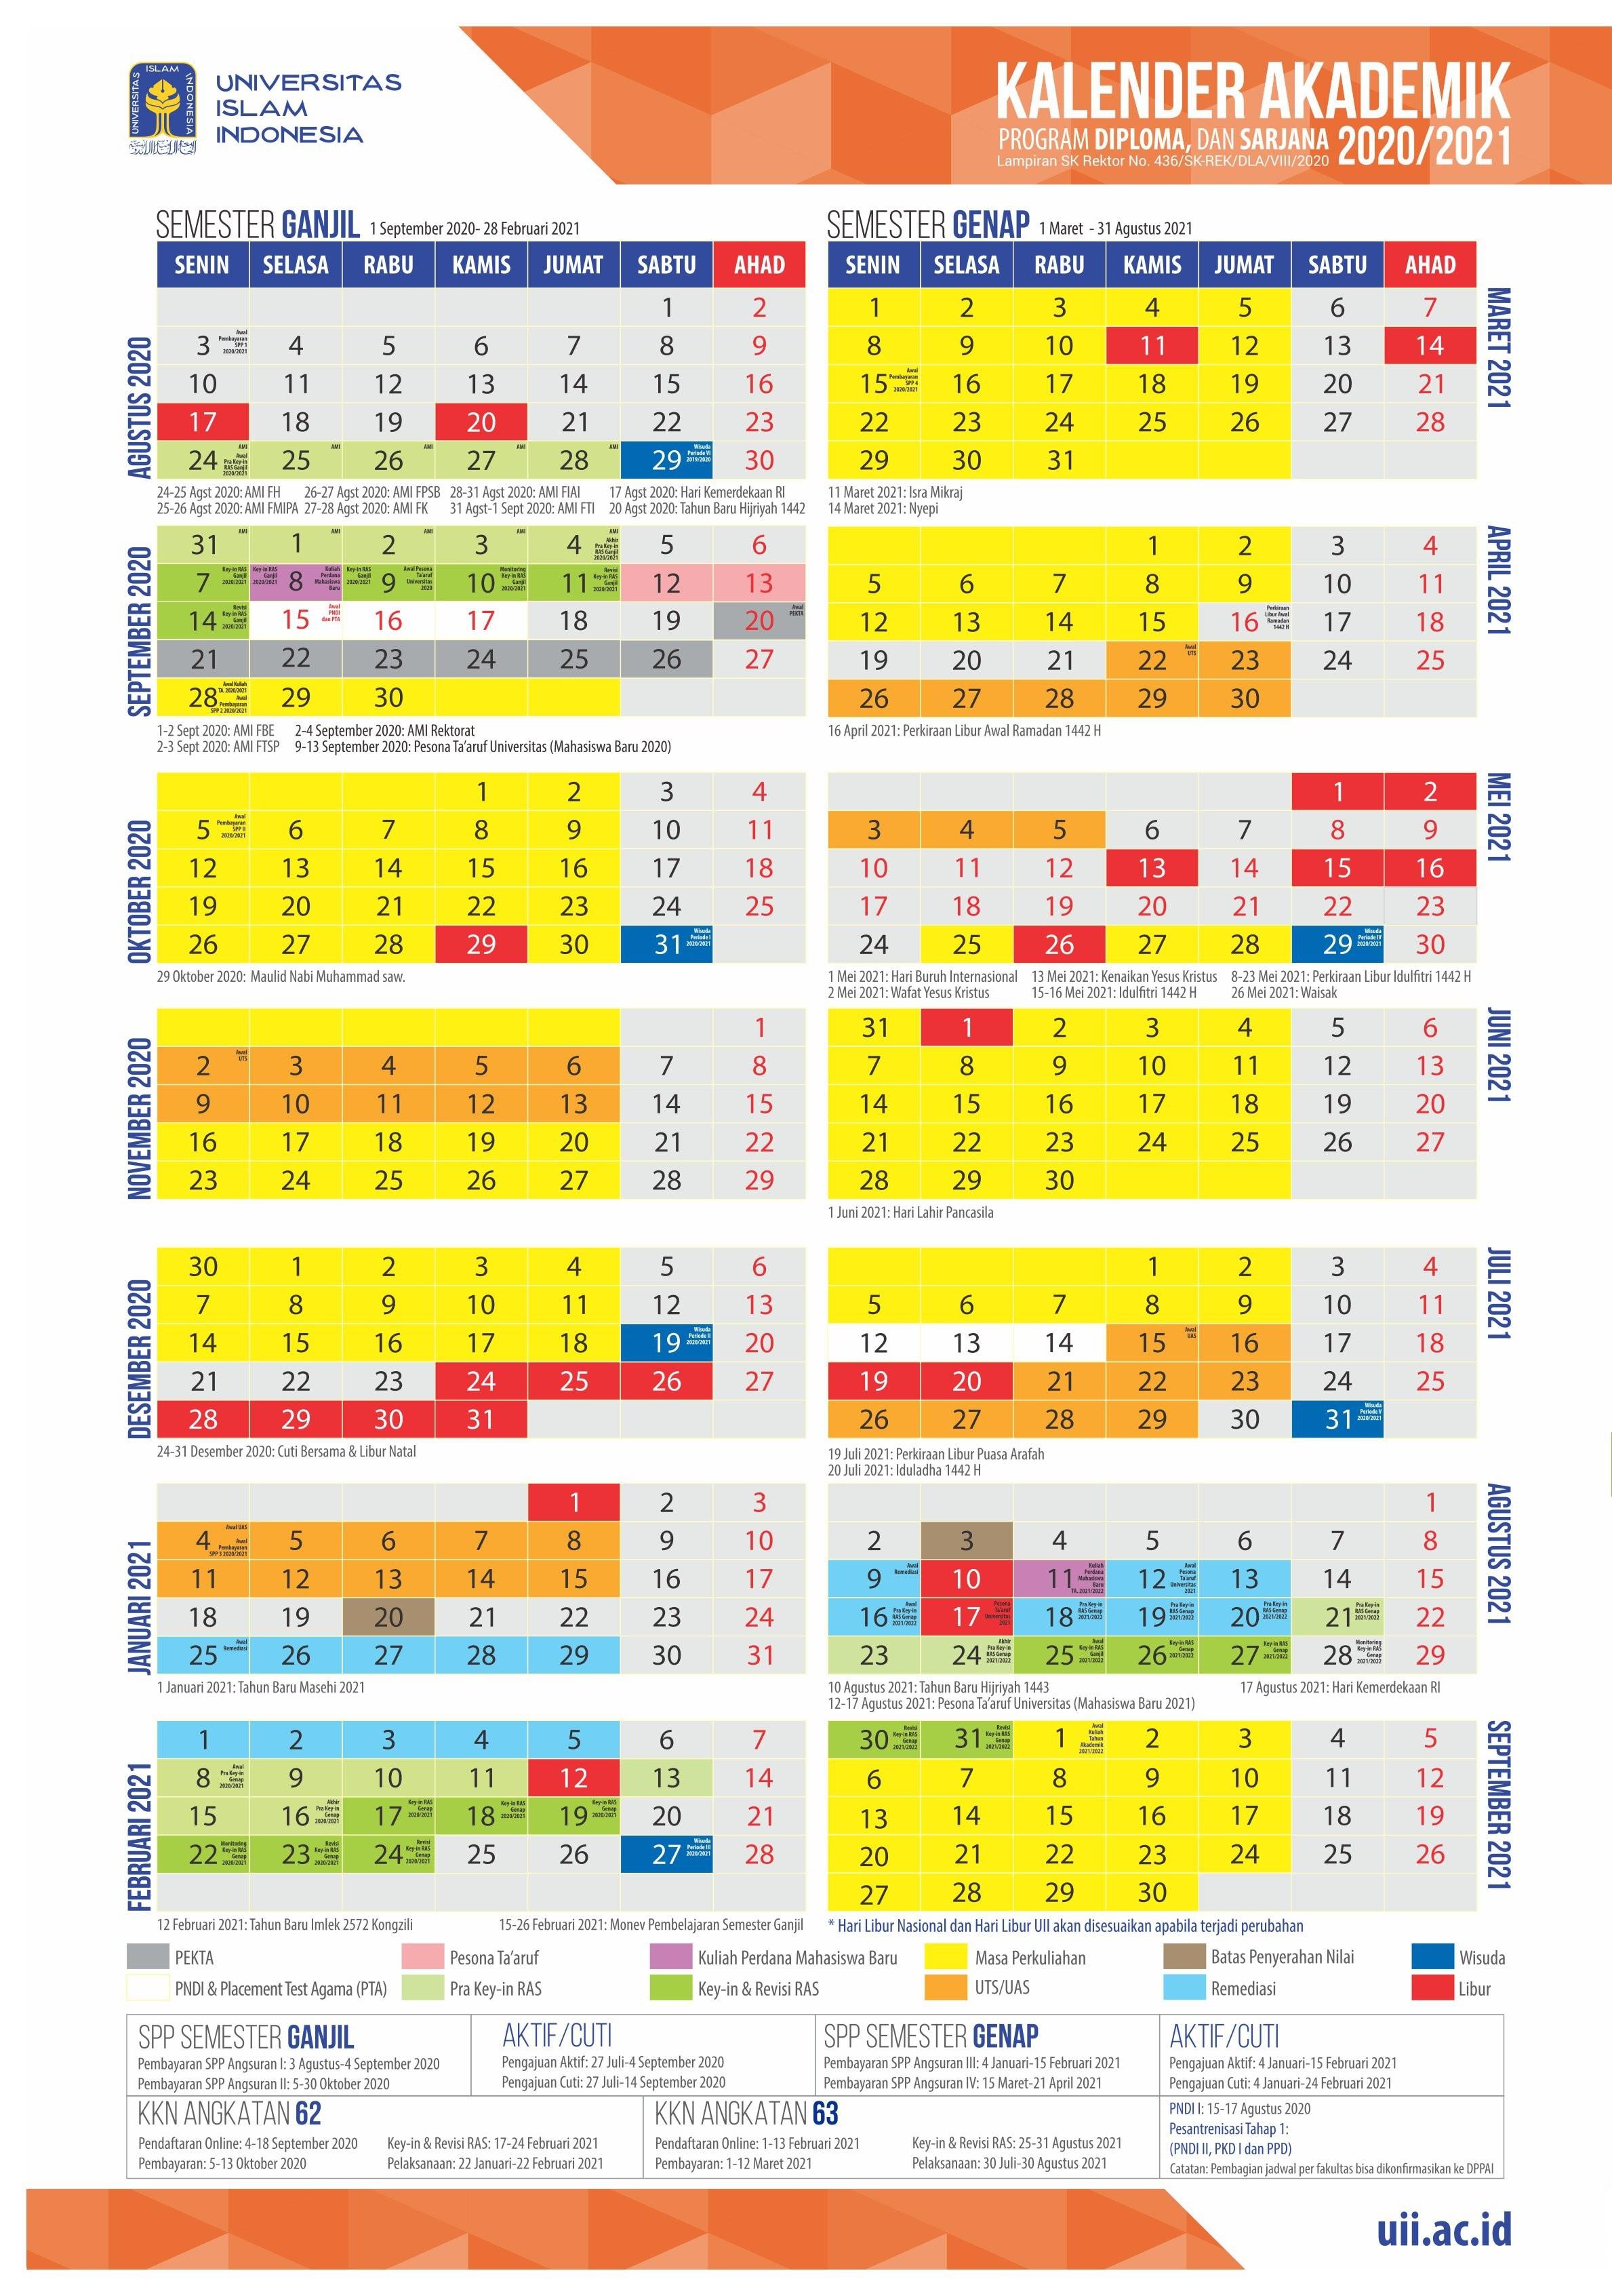 Kalender Akademik UII TA 2020/2021